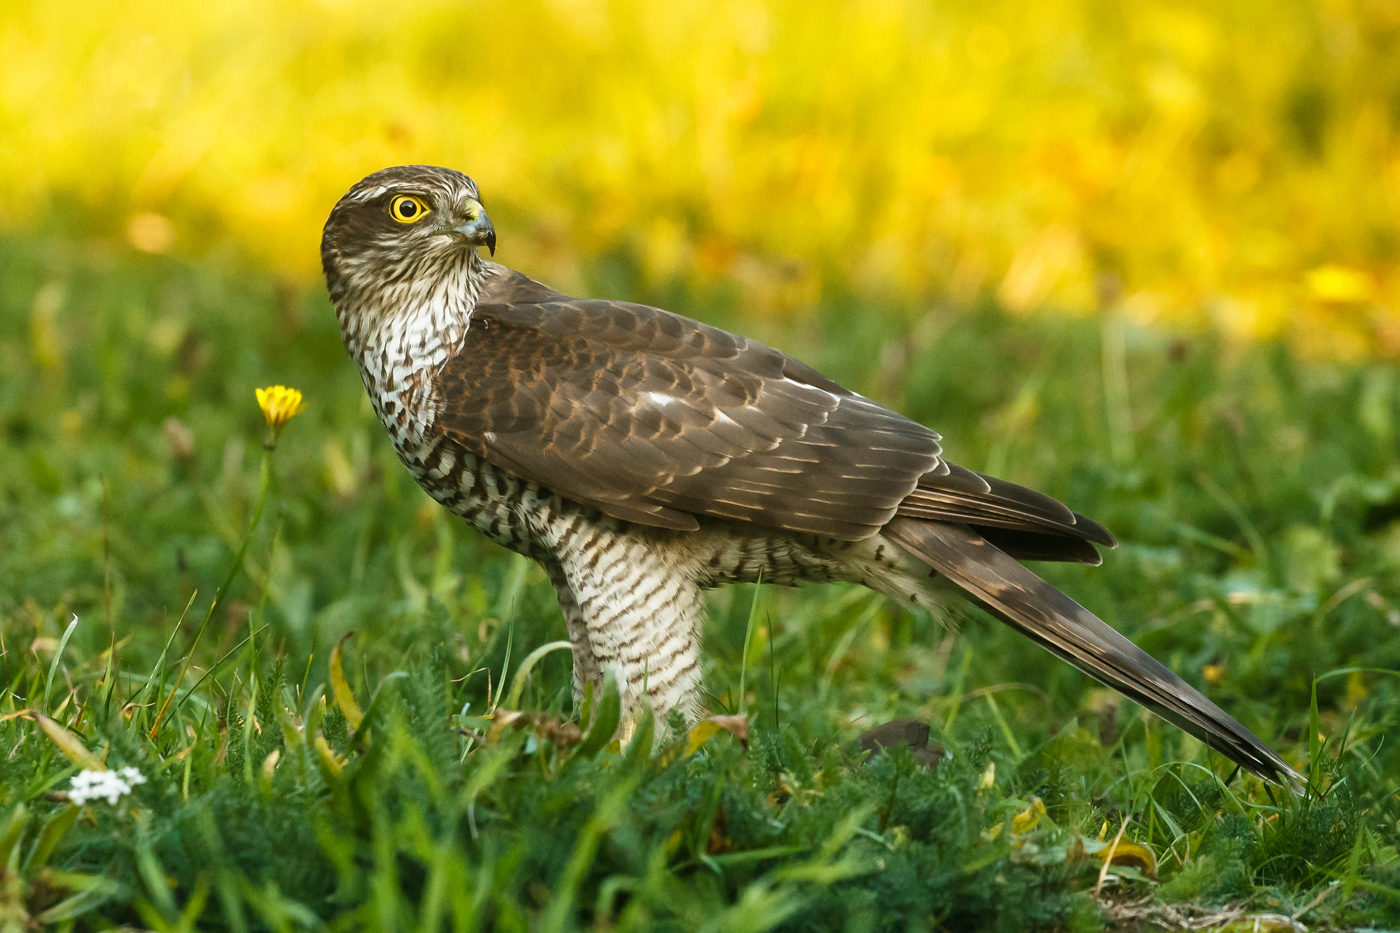 Sparrowhawk devouring prey (starling or pigeon?) in garden